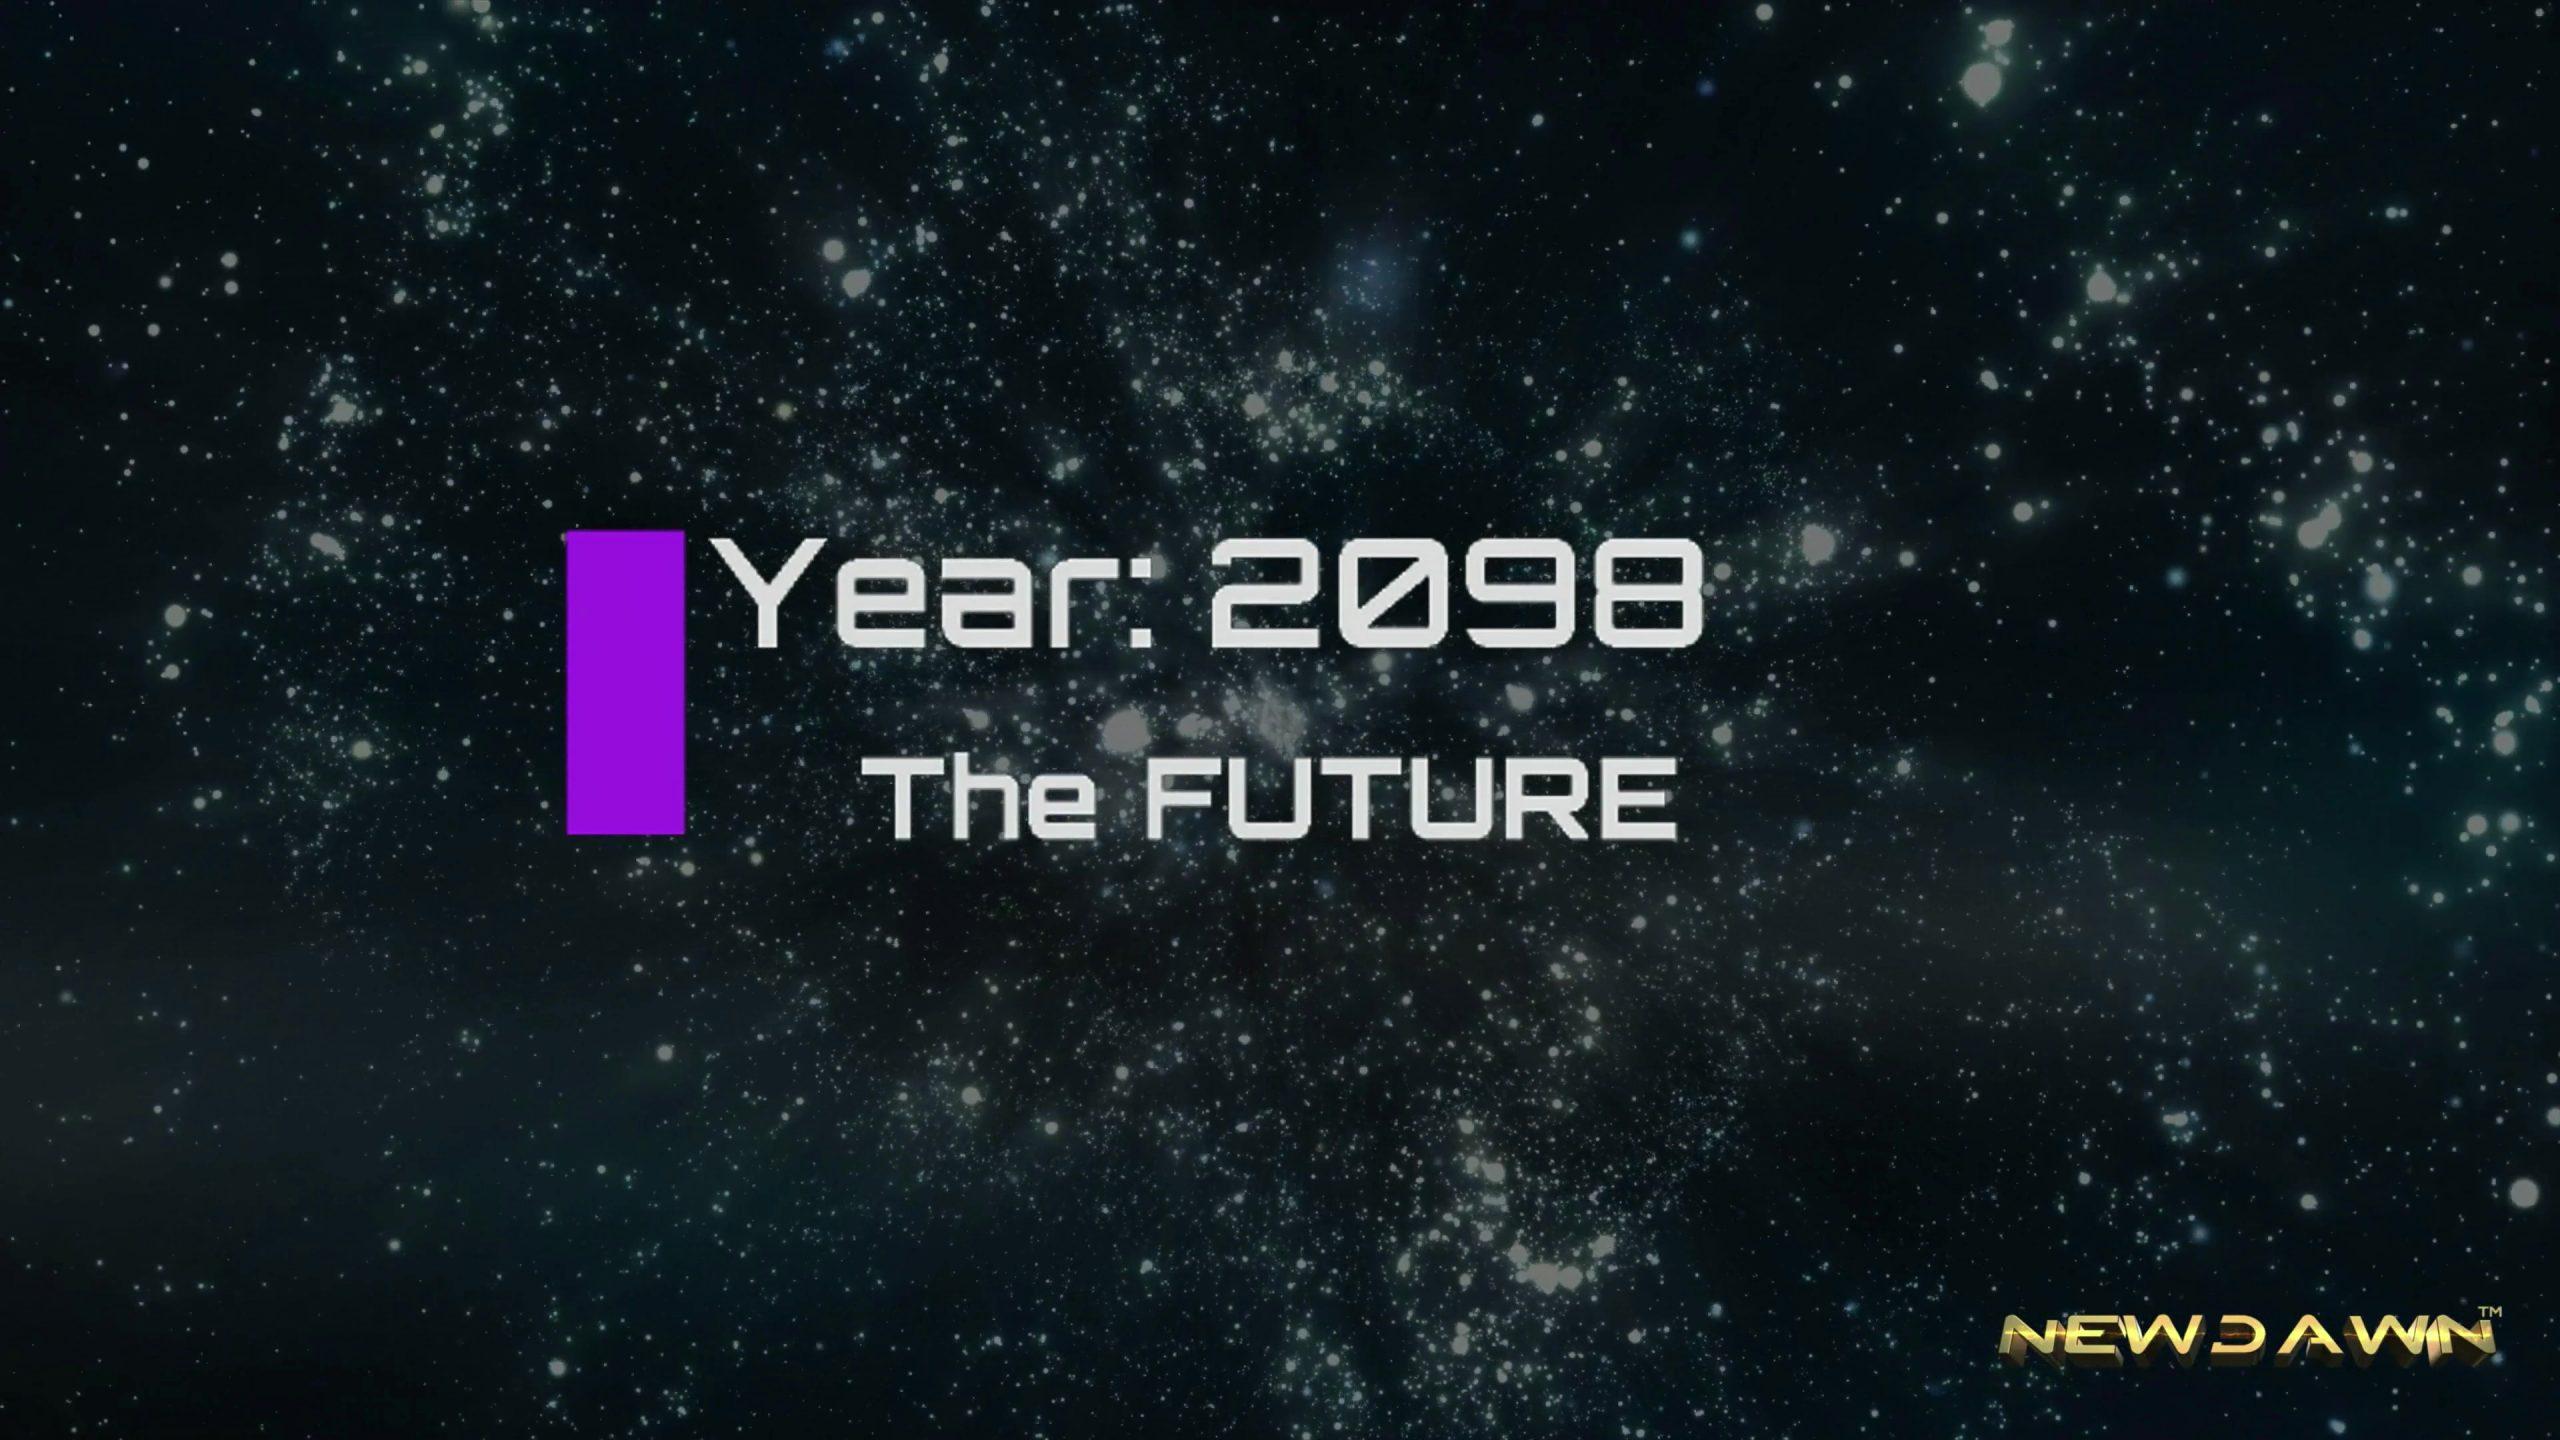 EMBRACING THE FUTURE